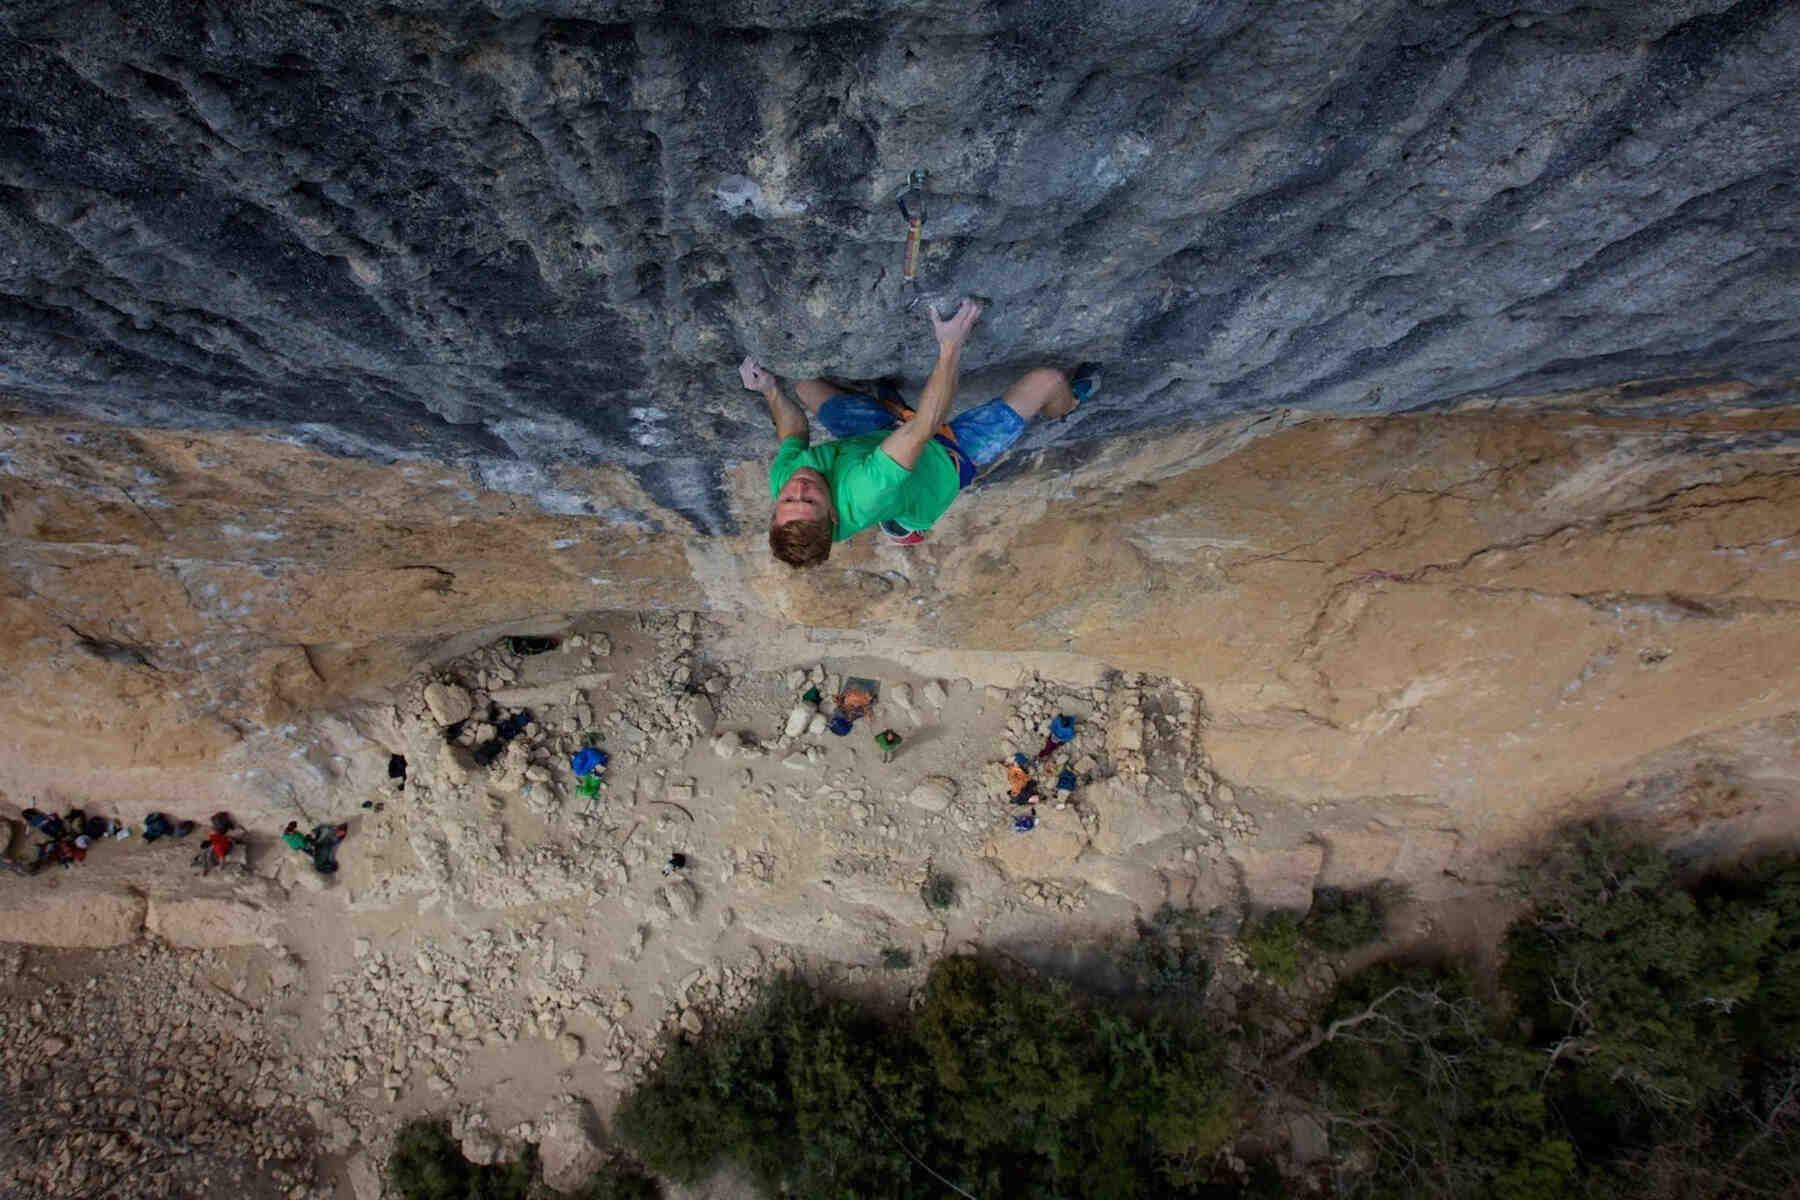 Magnus Midtbø - FrictionLabs Rock Climbing Chalk Pro Athlete